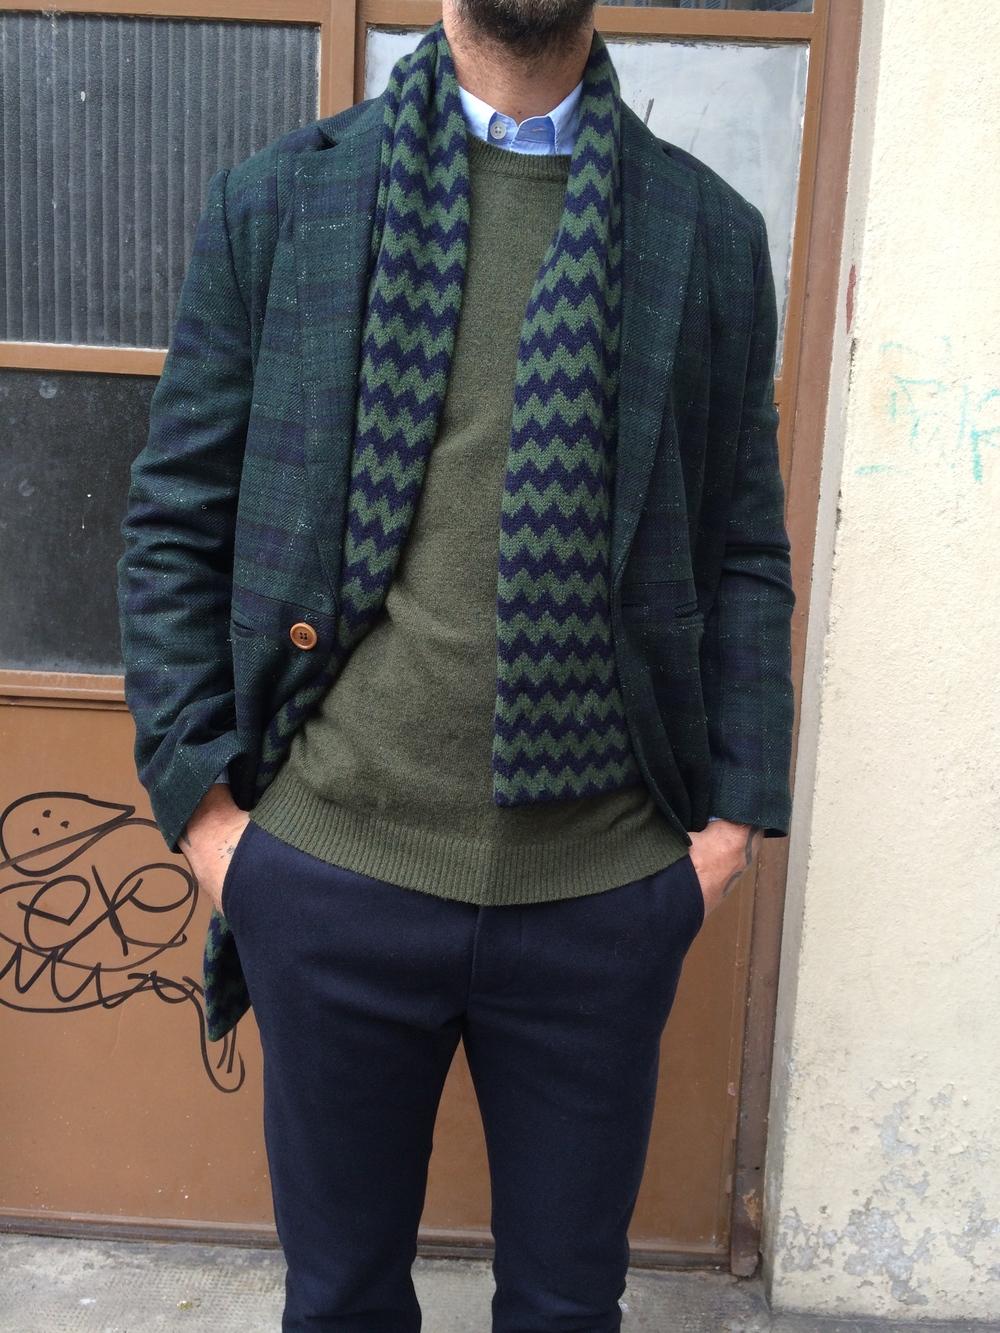 Silhouette Paradigme/Pullover cashemire et pantalon flanelle CLOSED/ Veste HENRIK VIBSKOV/ Echarpe HOWLIN'